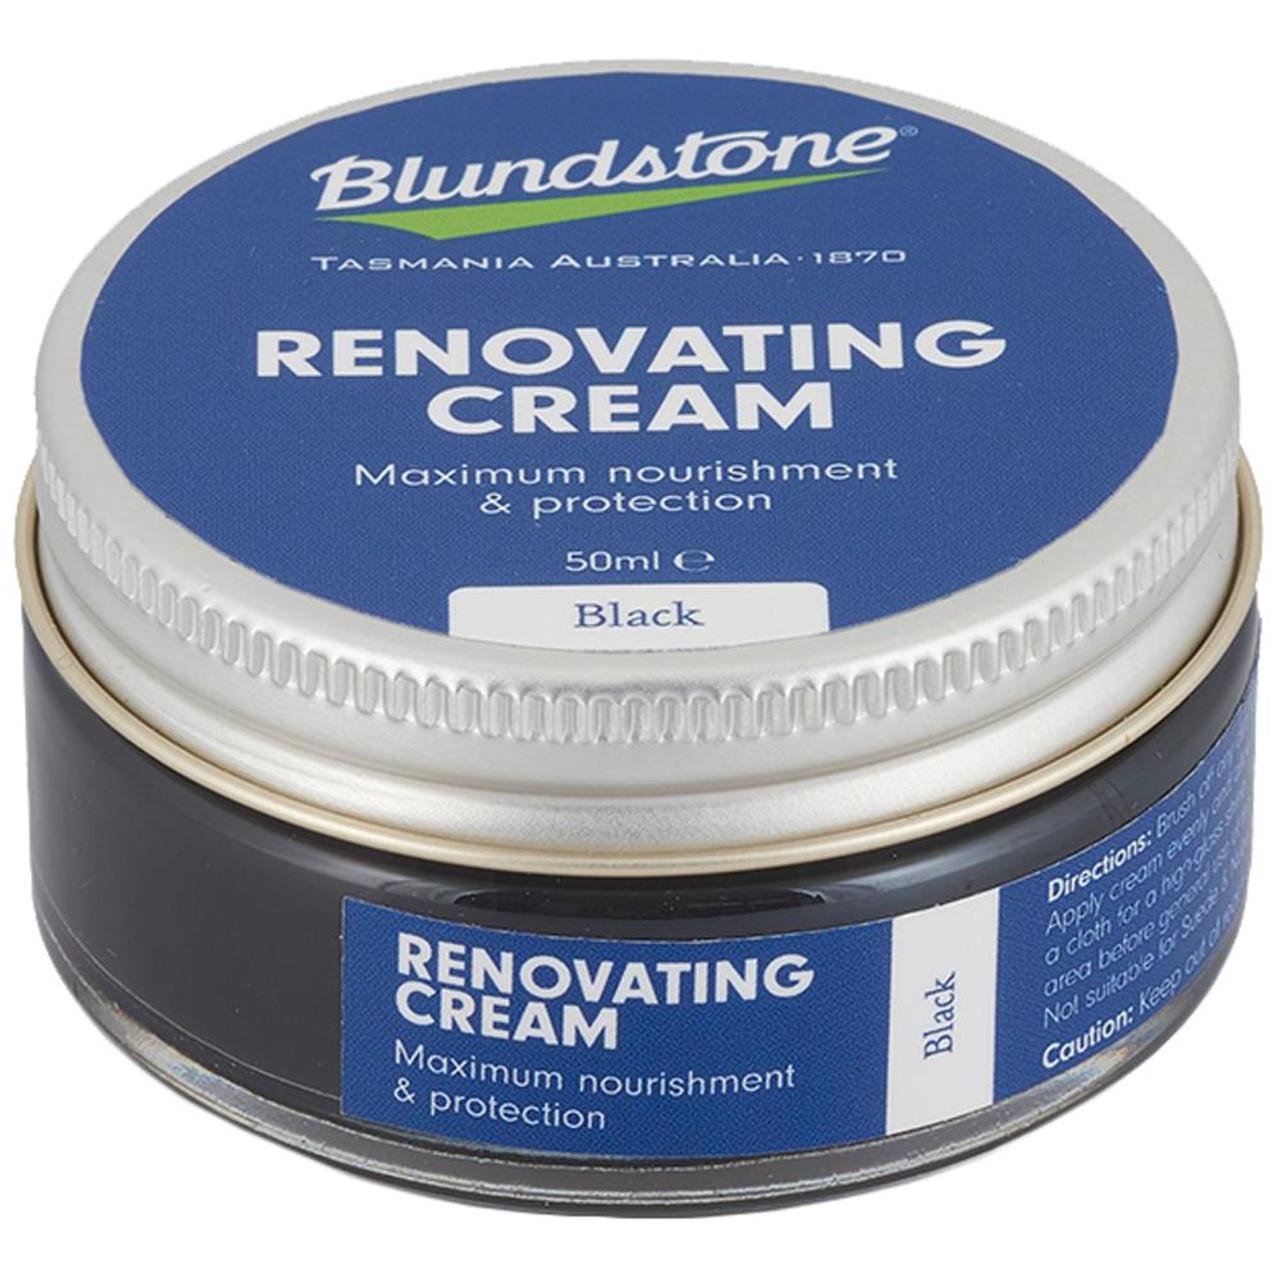 Blundstone Renovating Cream Black